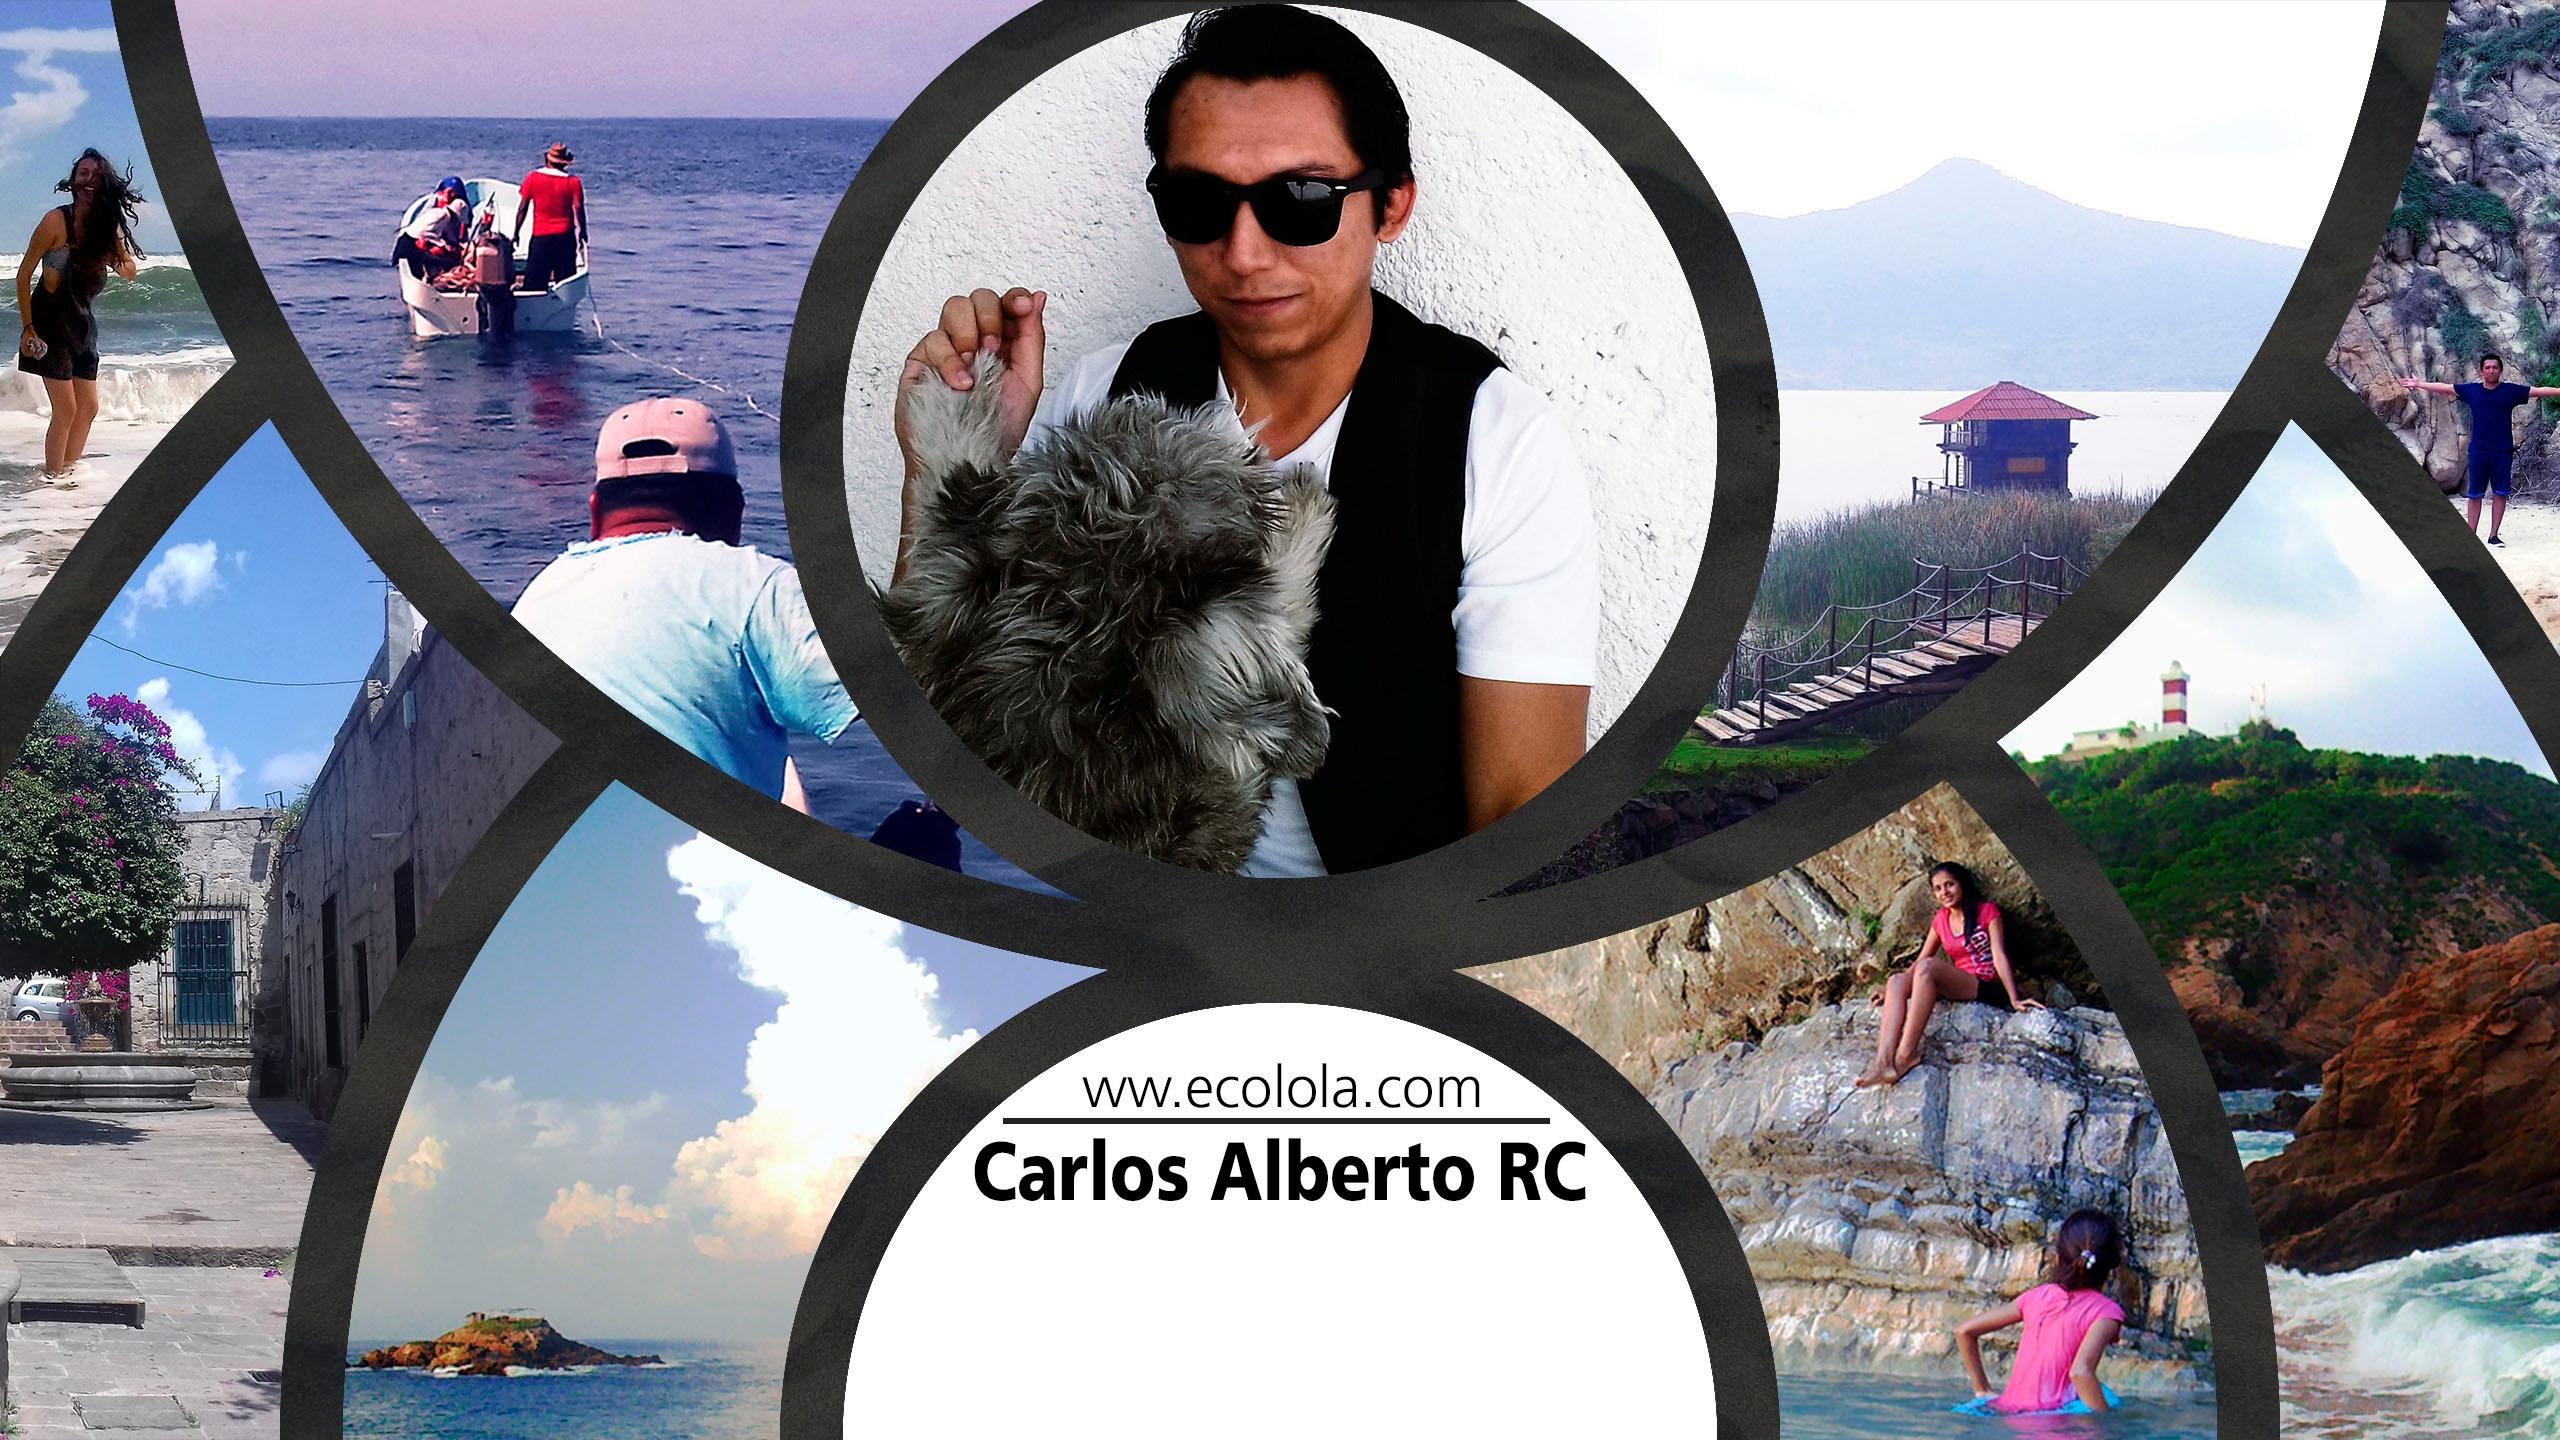 carlosalbertorc (@carlosalbertorc) Cover Image